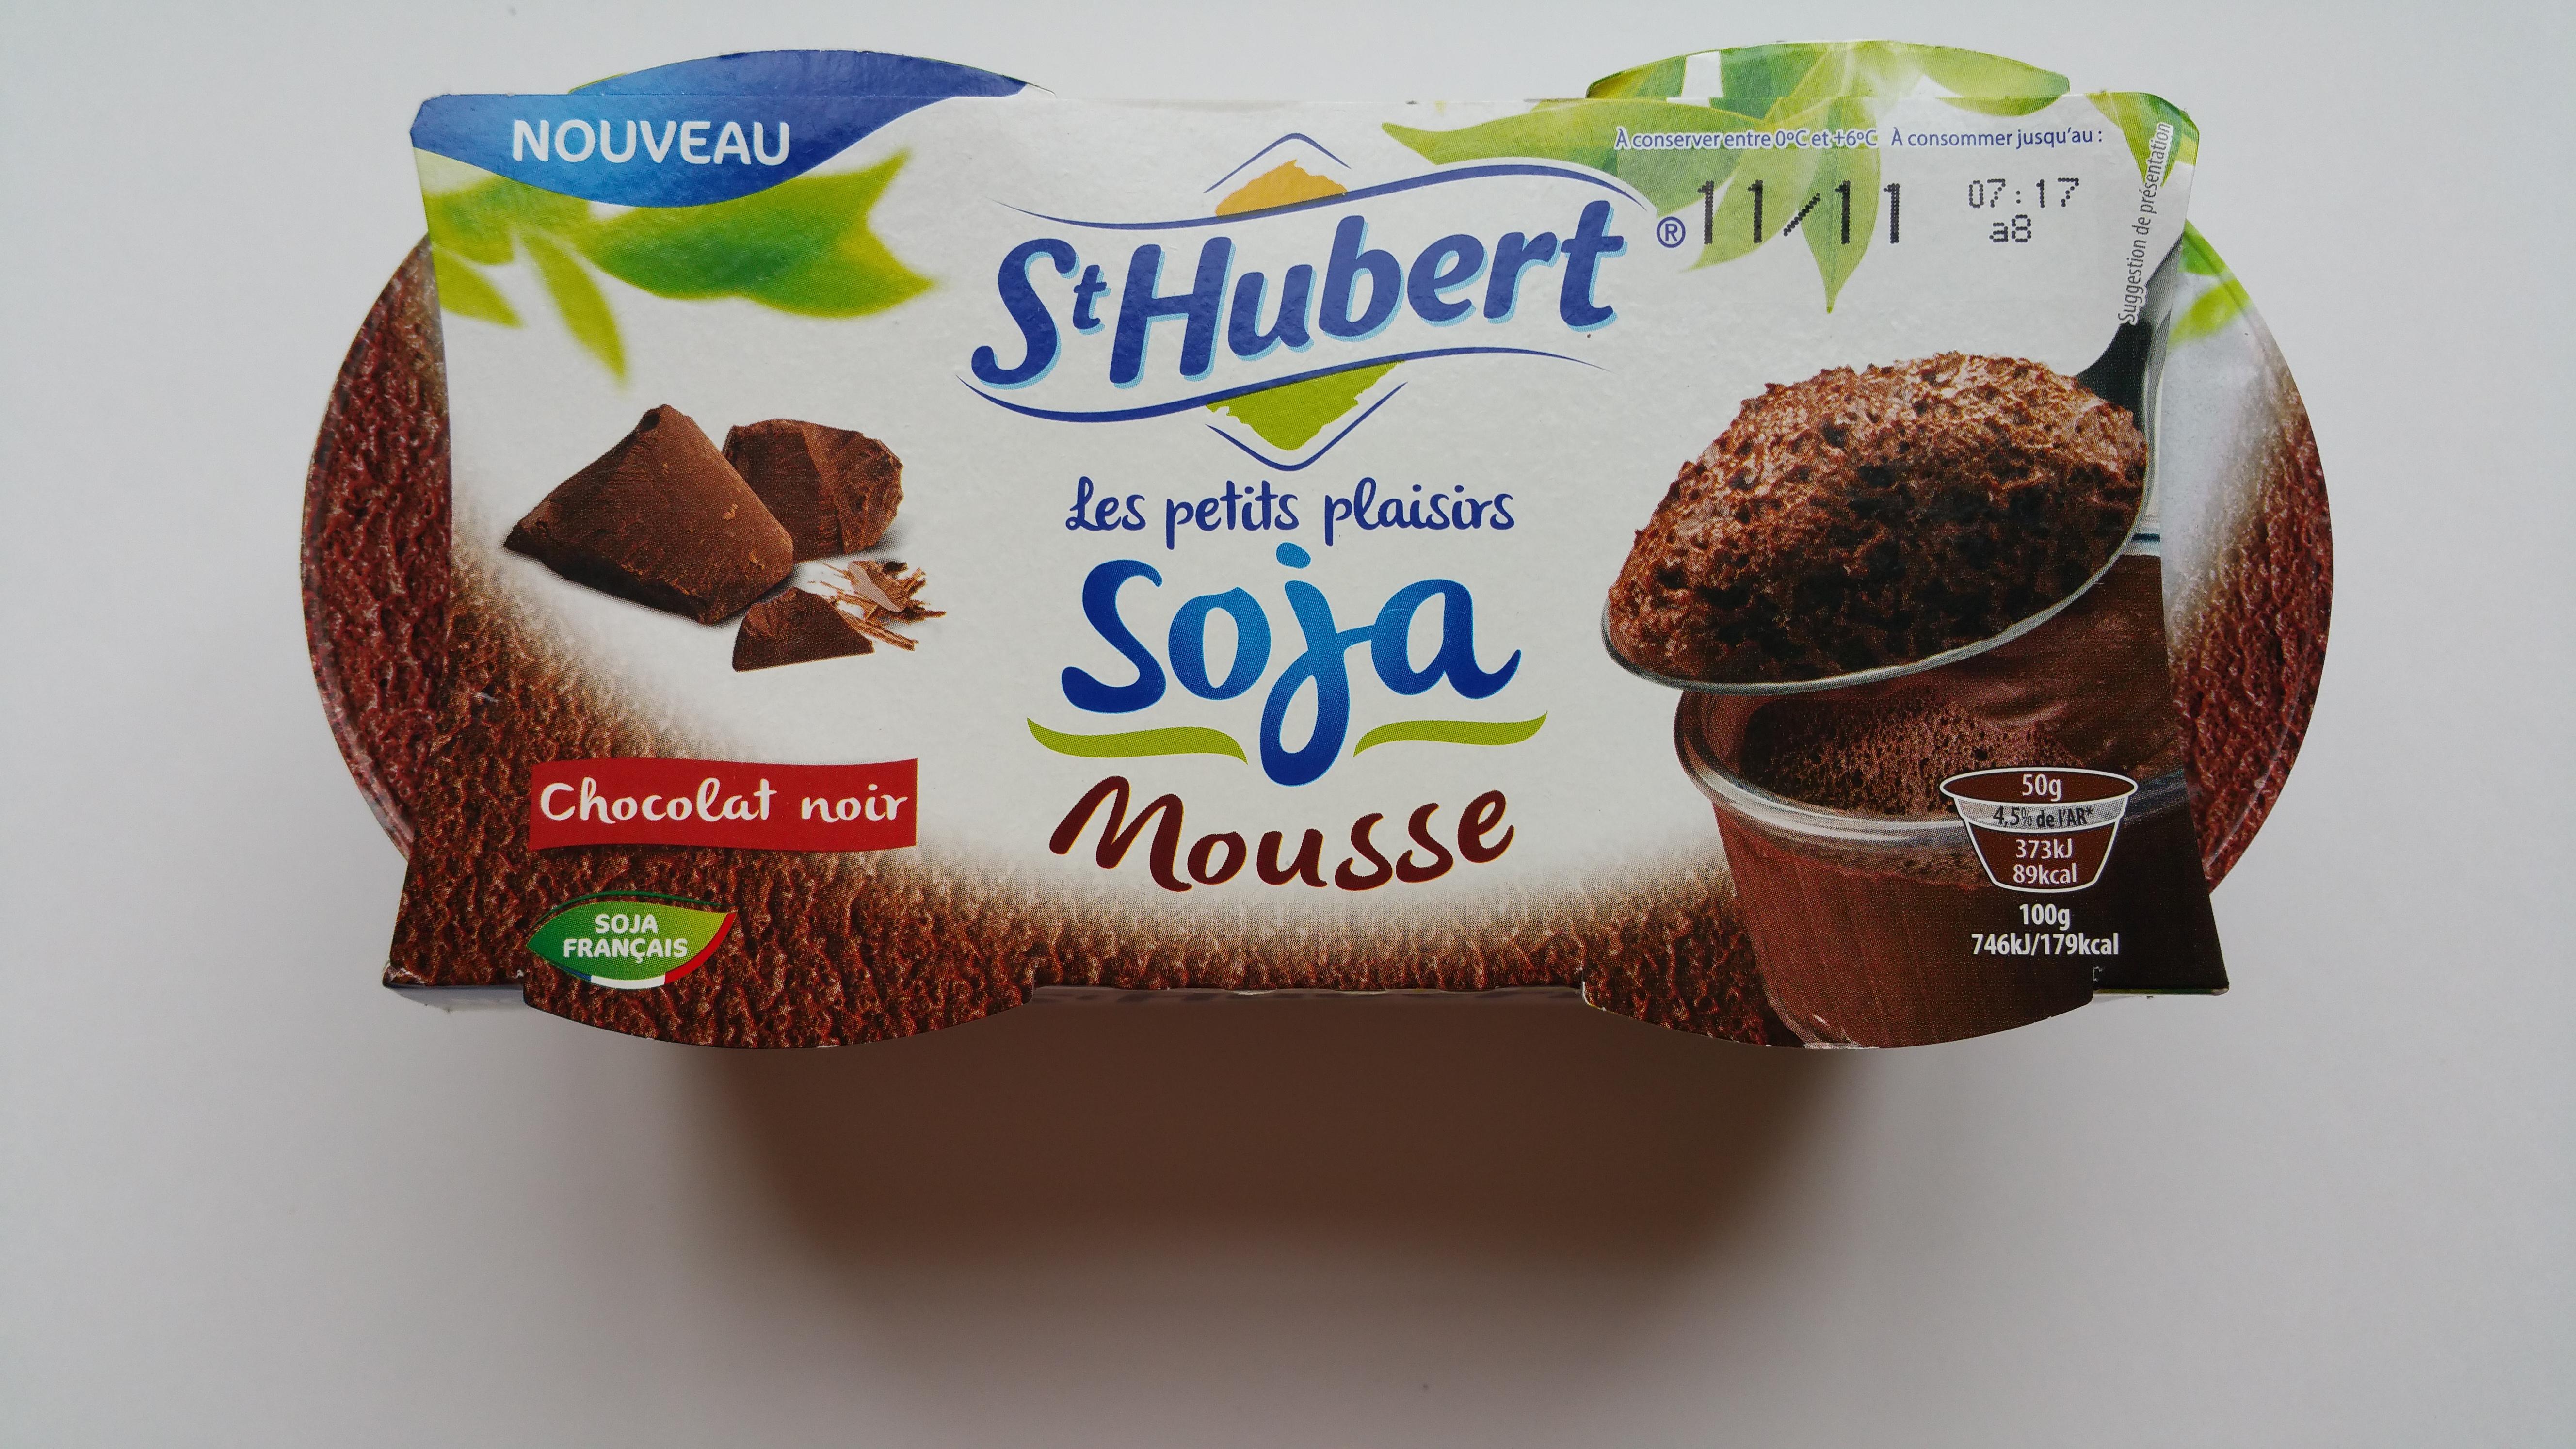 St-Hubert-Petits-Plaisirs-Soja®-Mousse-chocolat-noir - St-Hubert-Les-Petits-Plaisirs-Soja®-Mousse-chocolat-noir-5.jpg